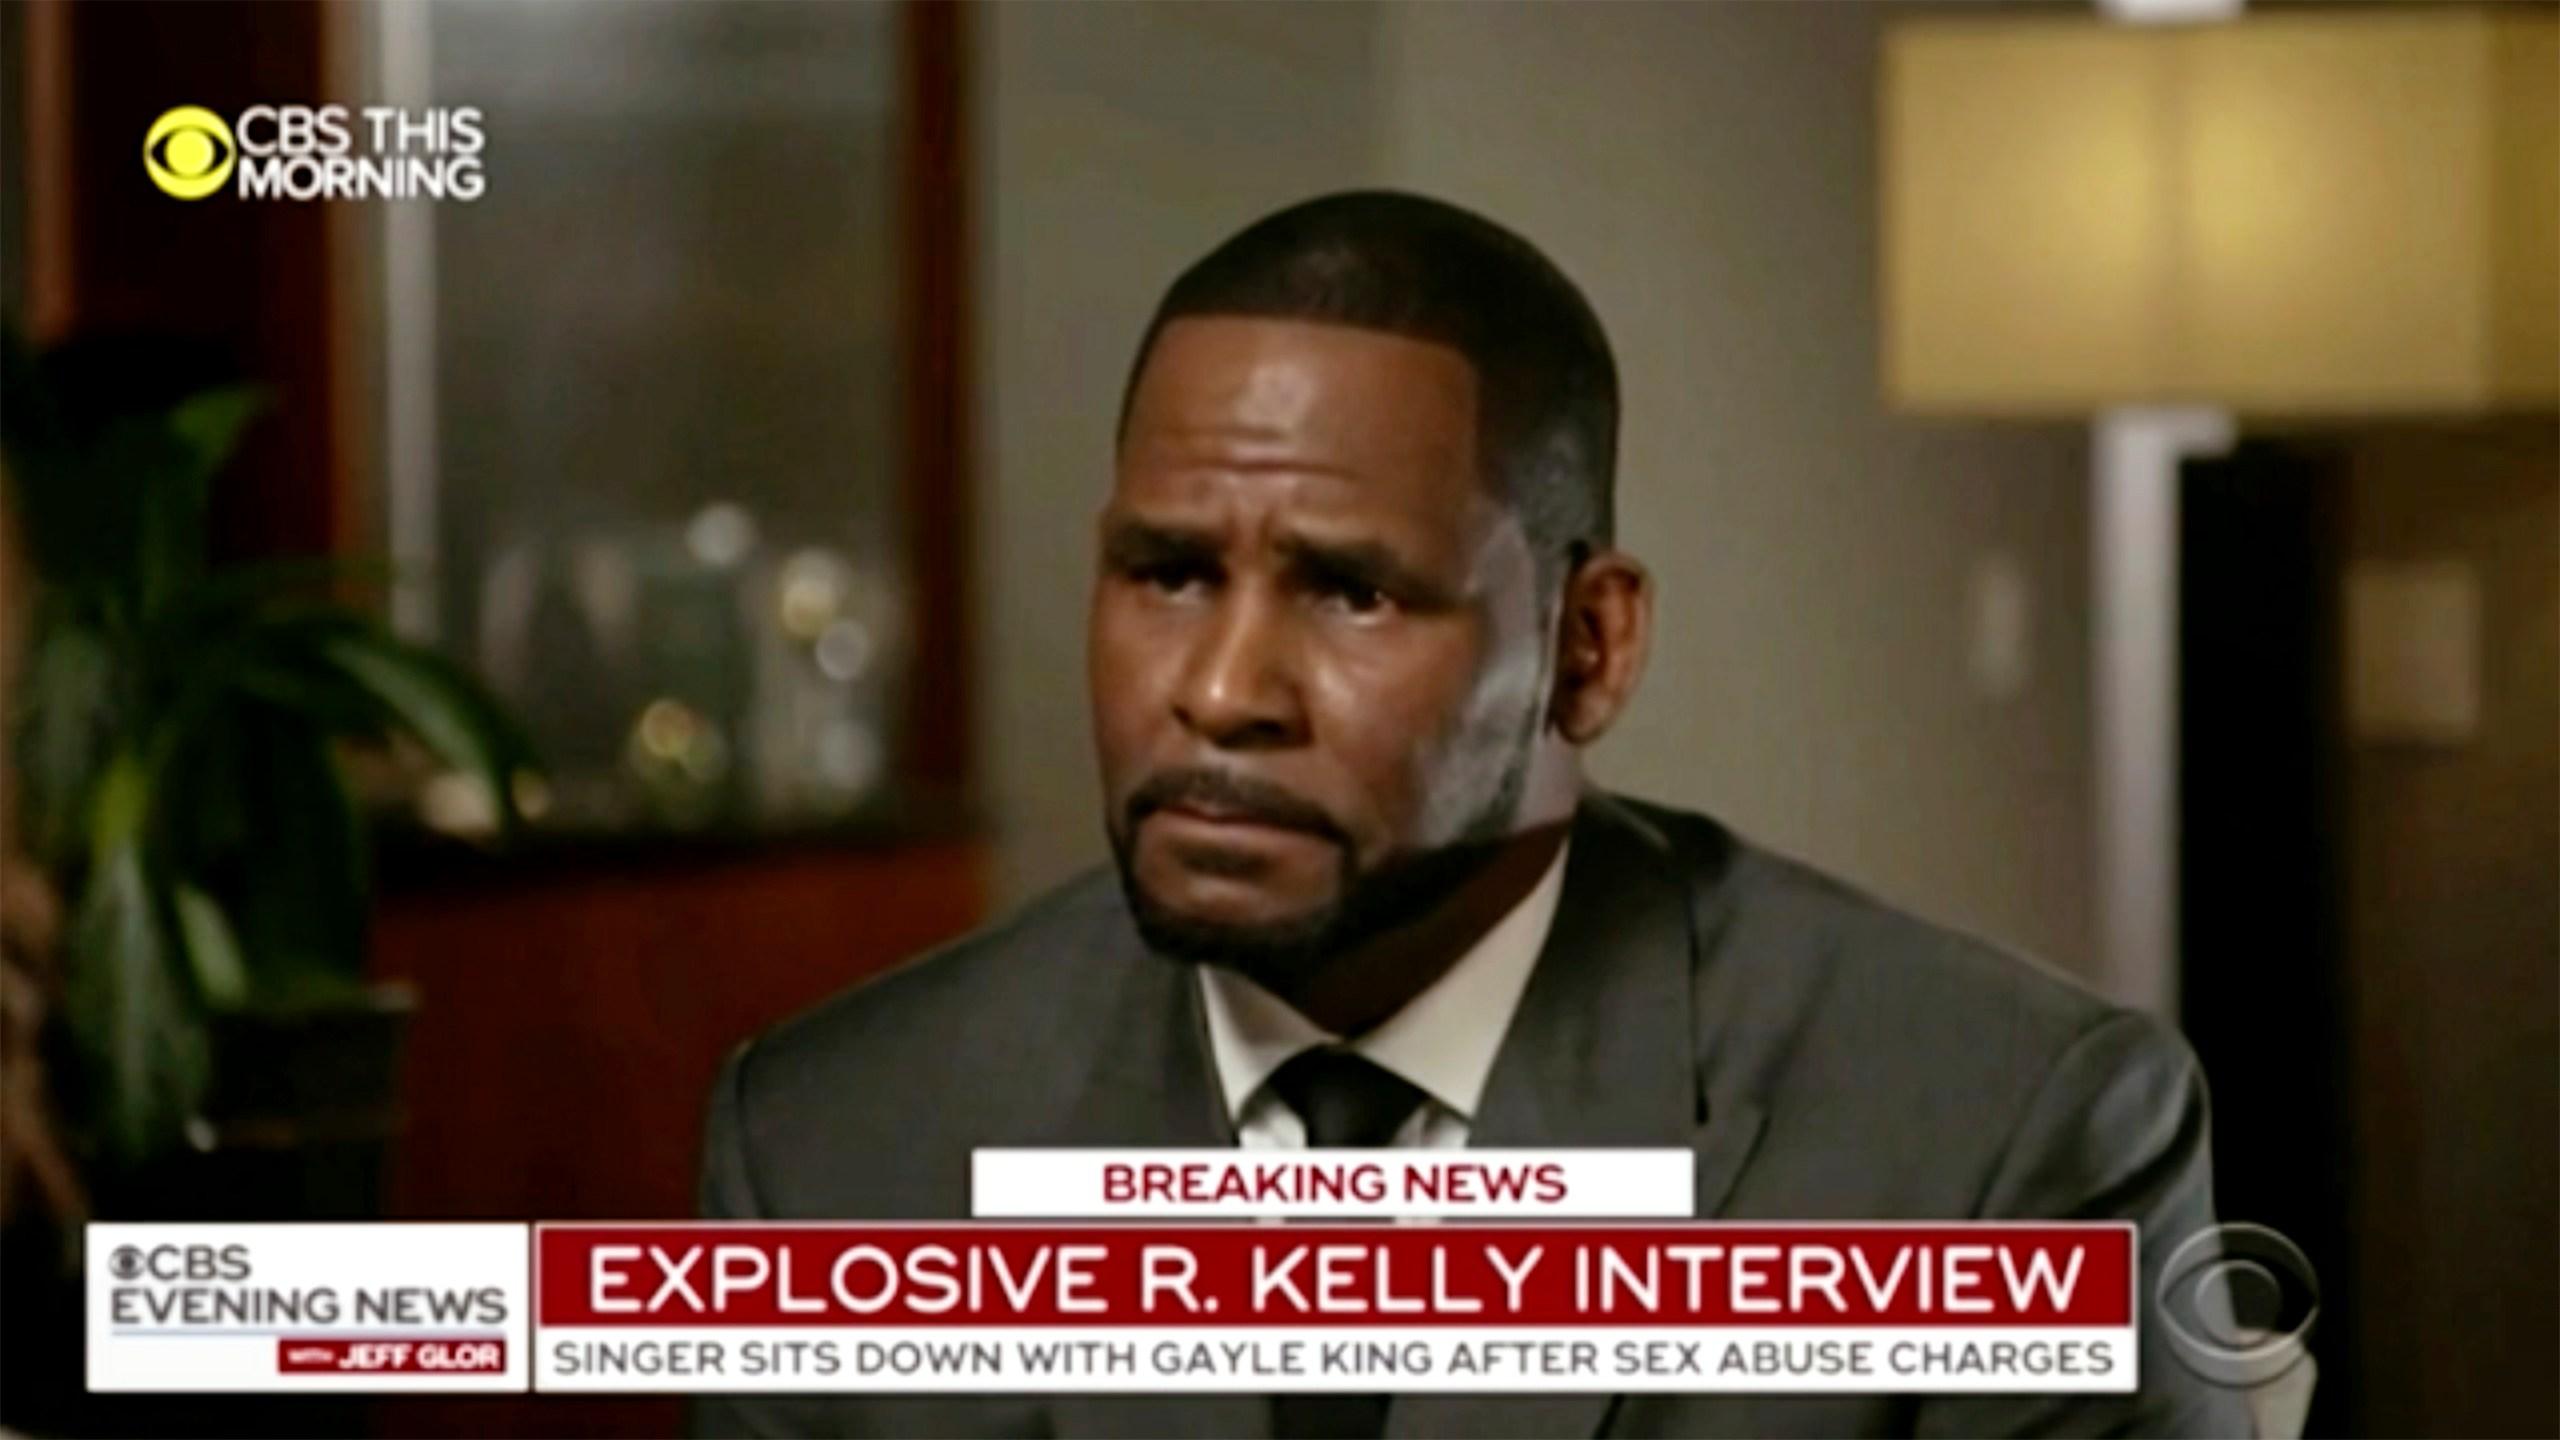 R_Kelly_Investigations_Interview_80126-159532.jpg13633537